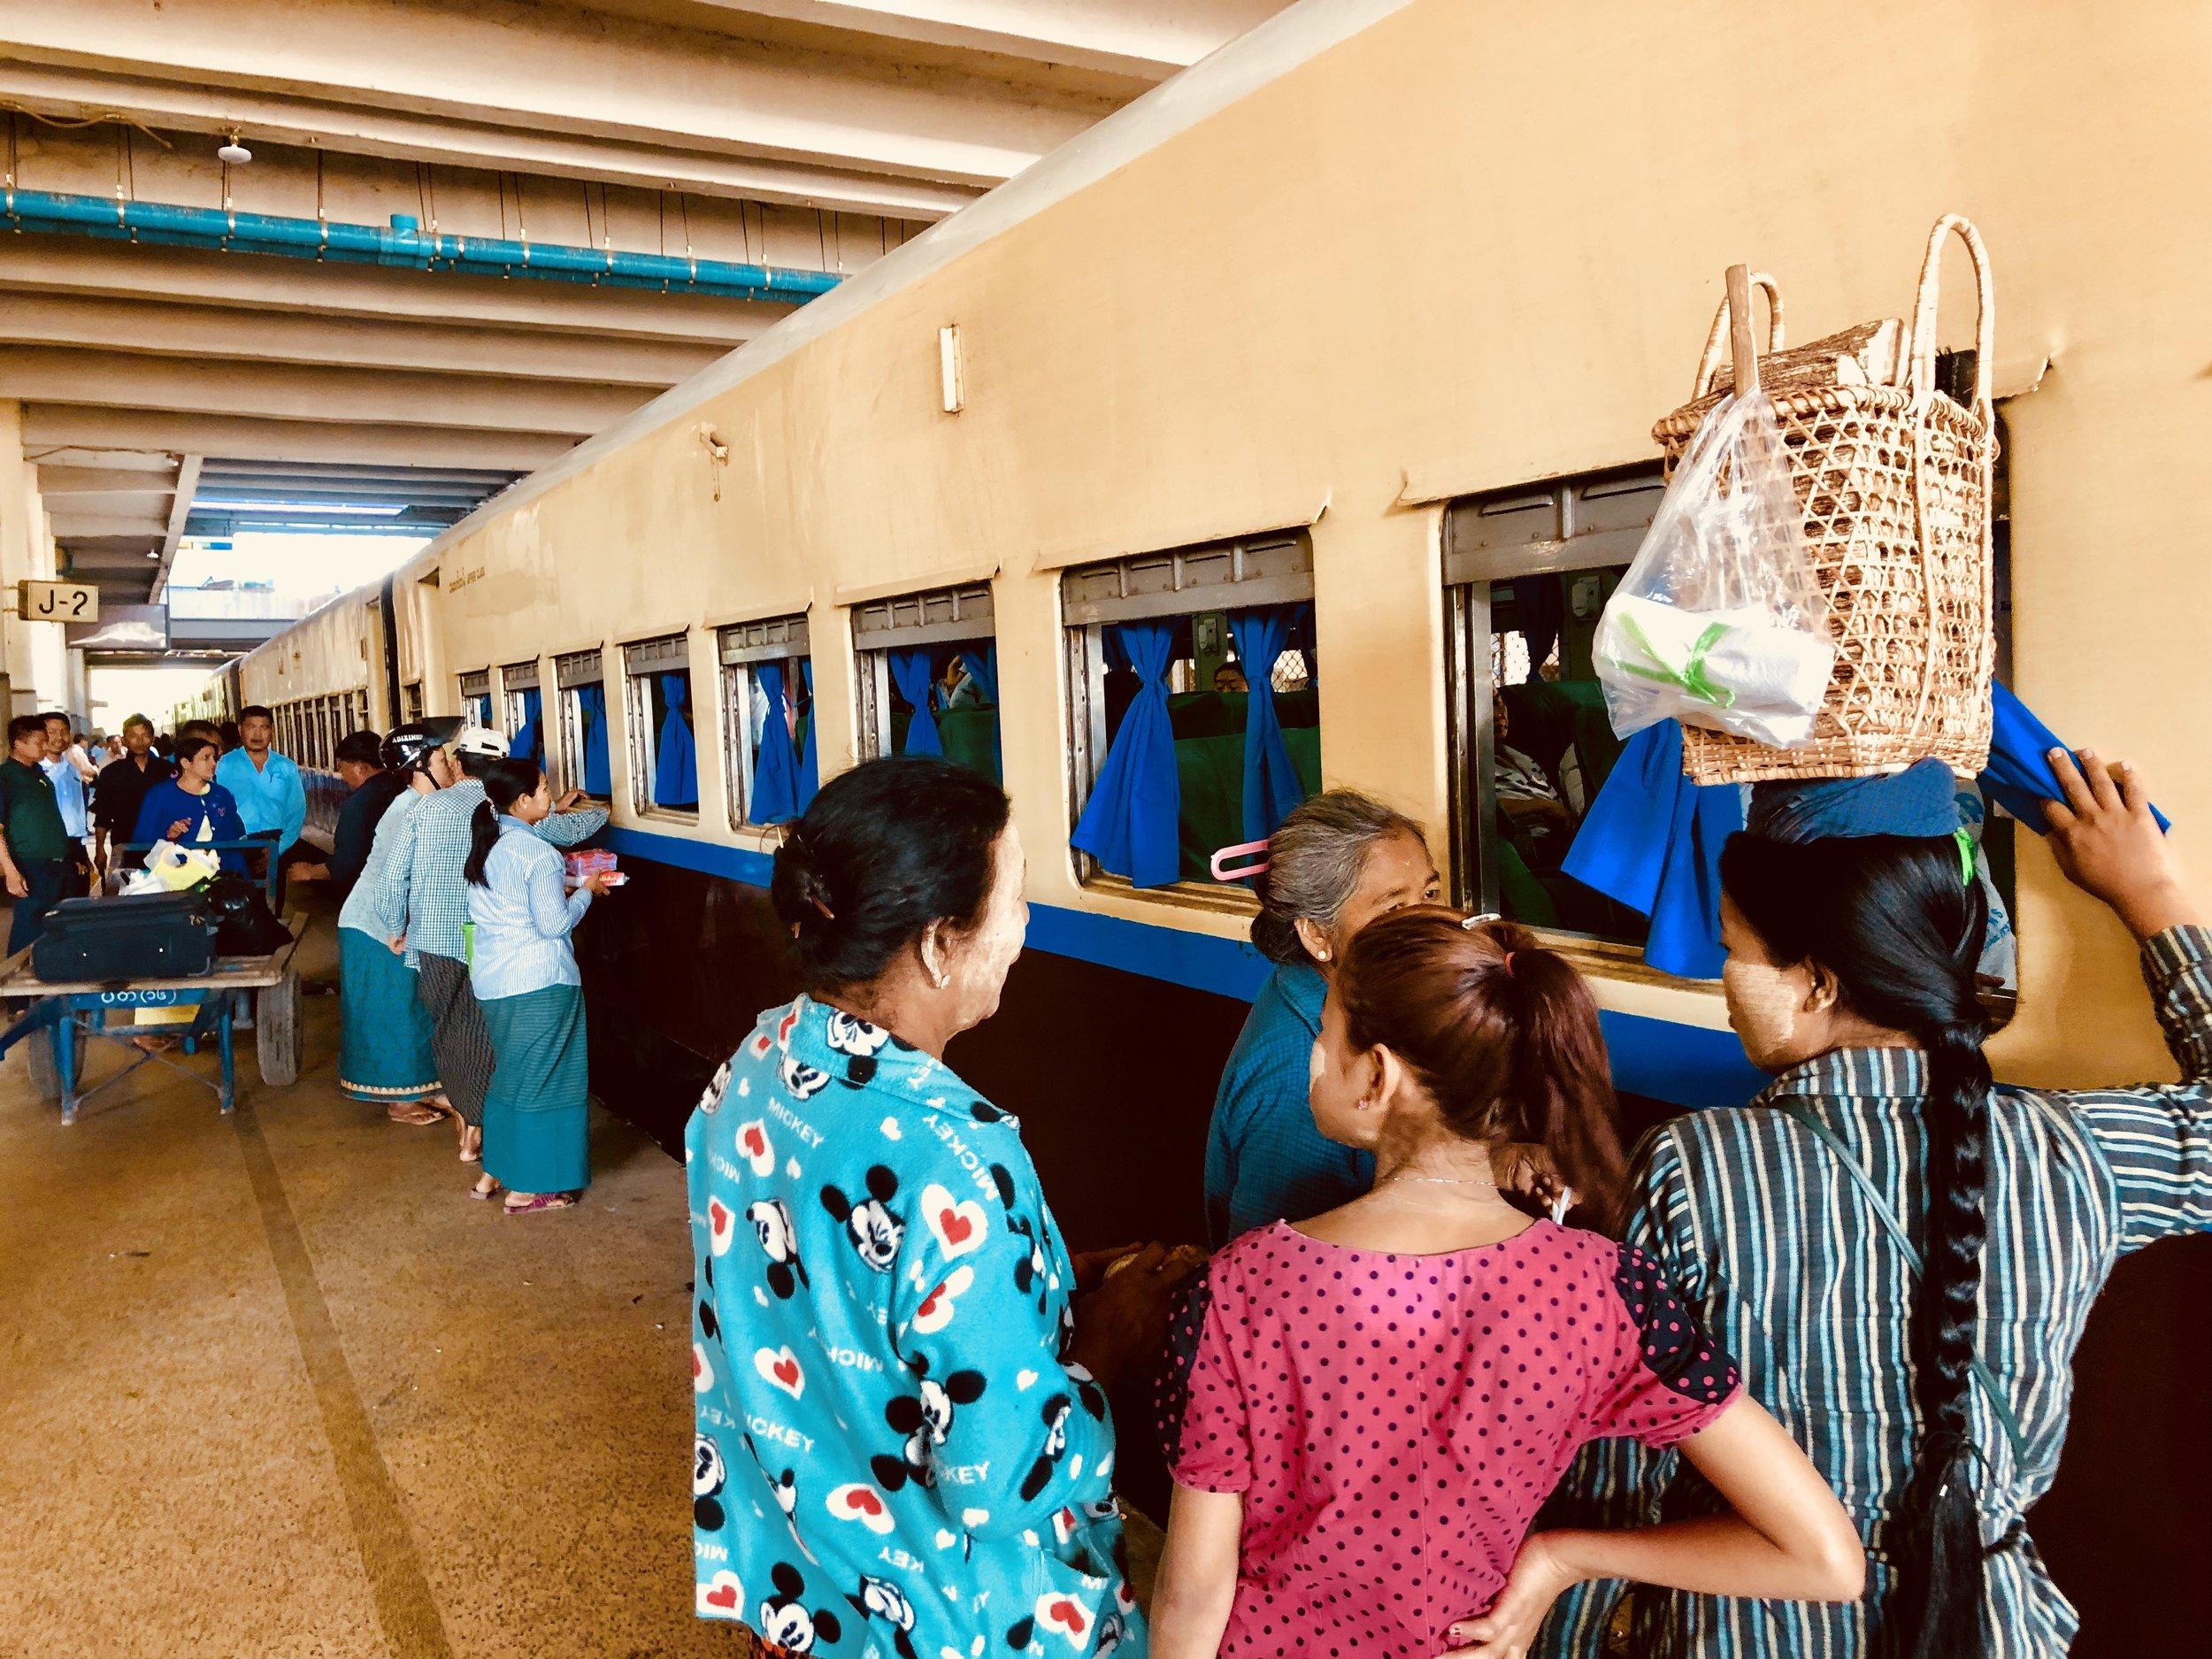 Boarding the train in Mandalay